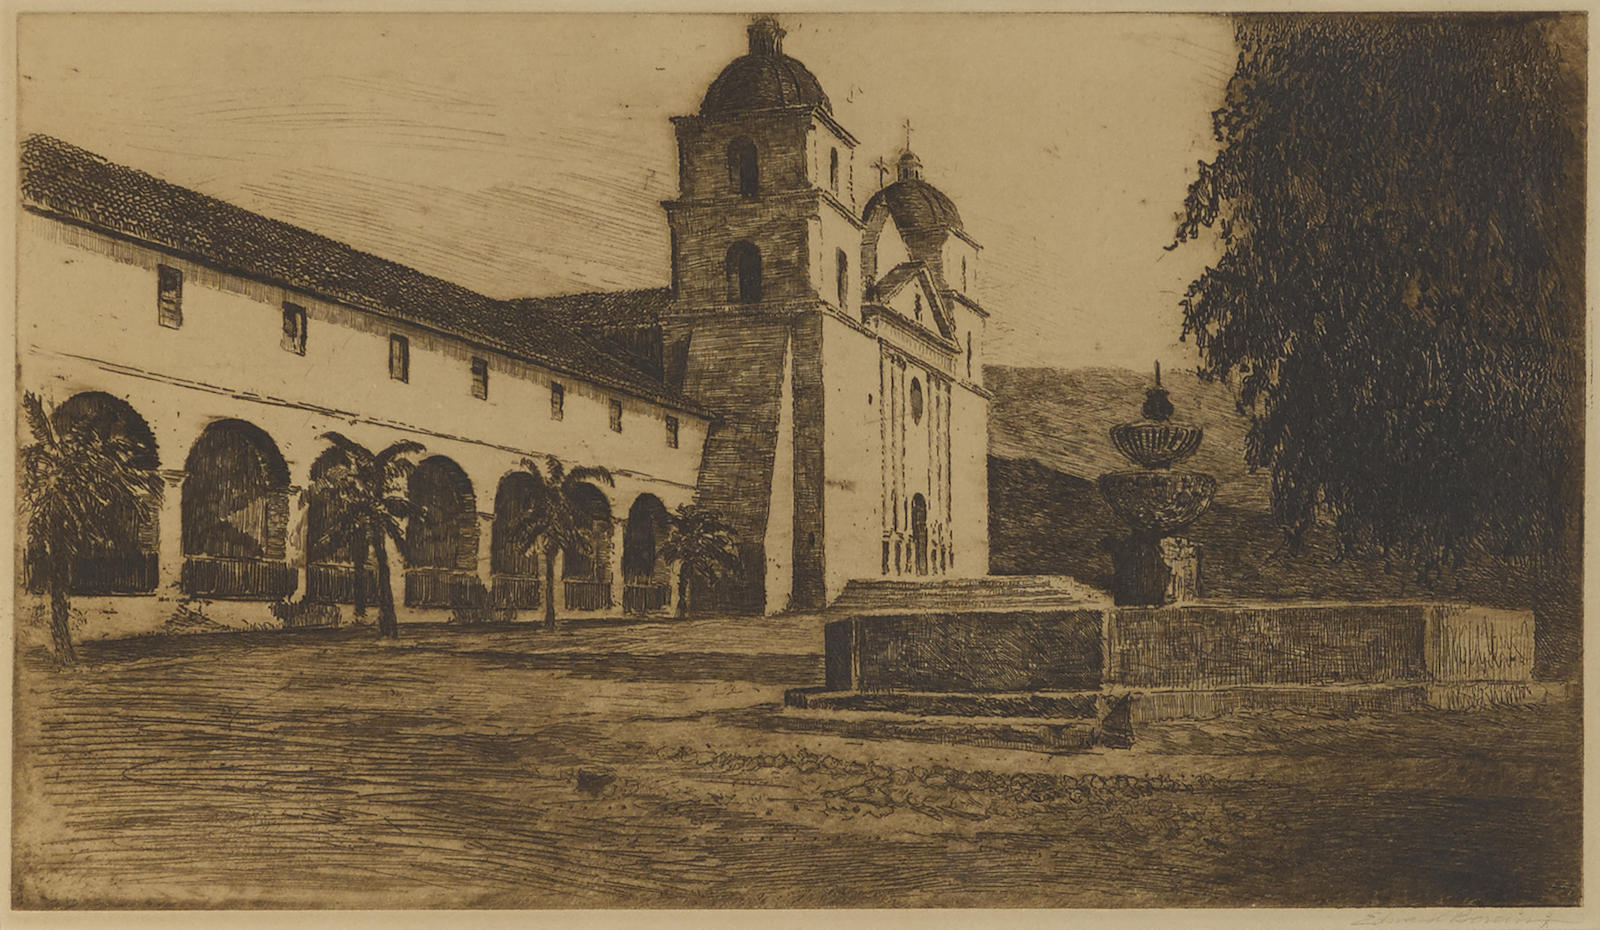 Edward Borein-Mission Santa Barbara, No. 3 (G. 250)-